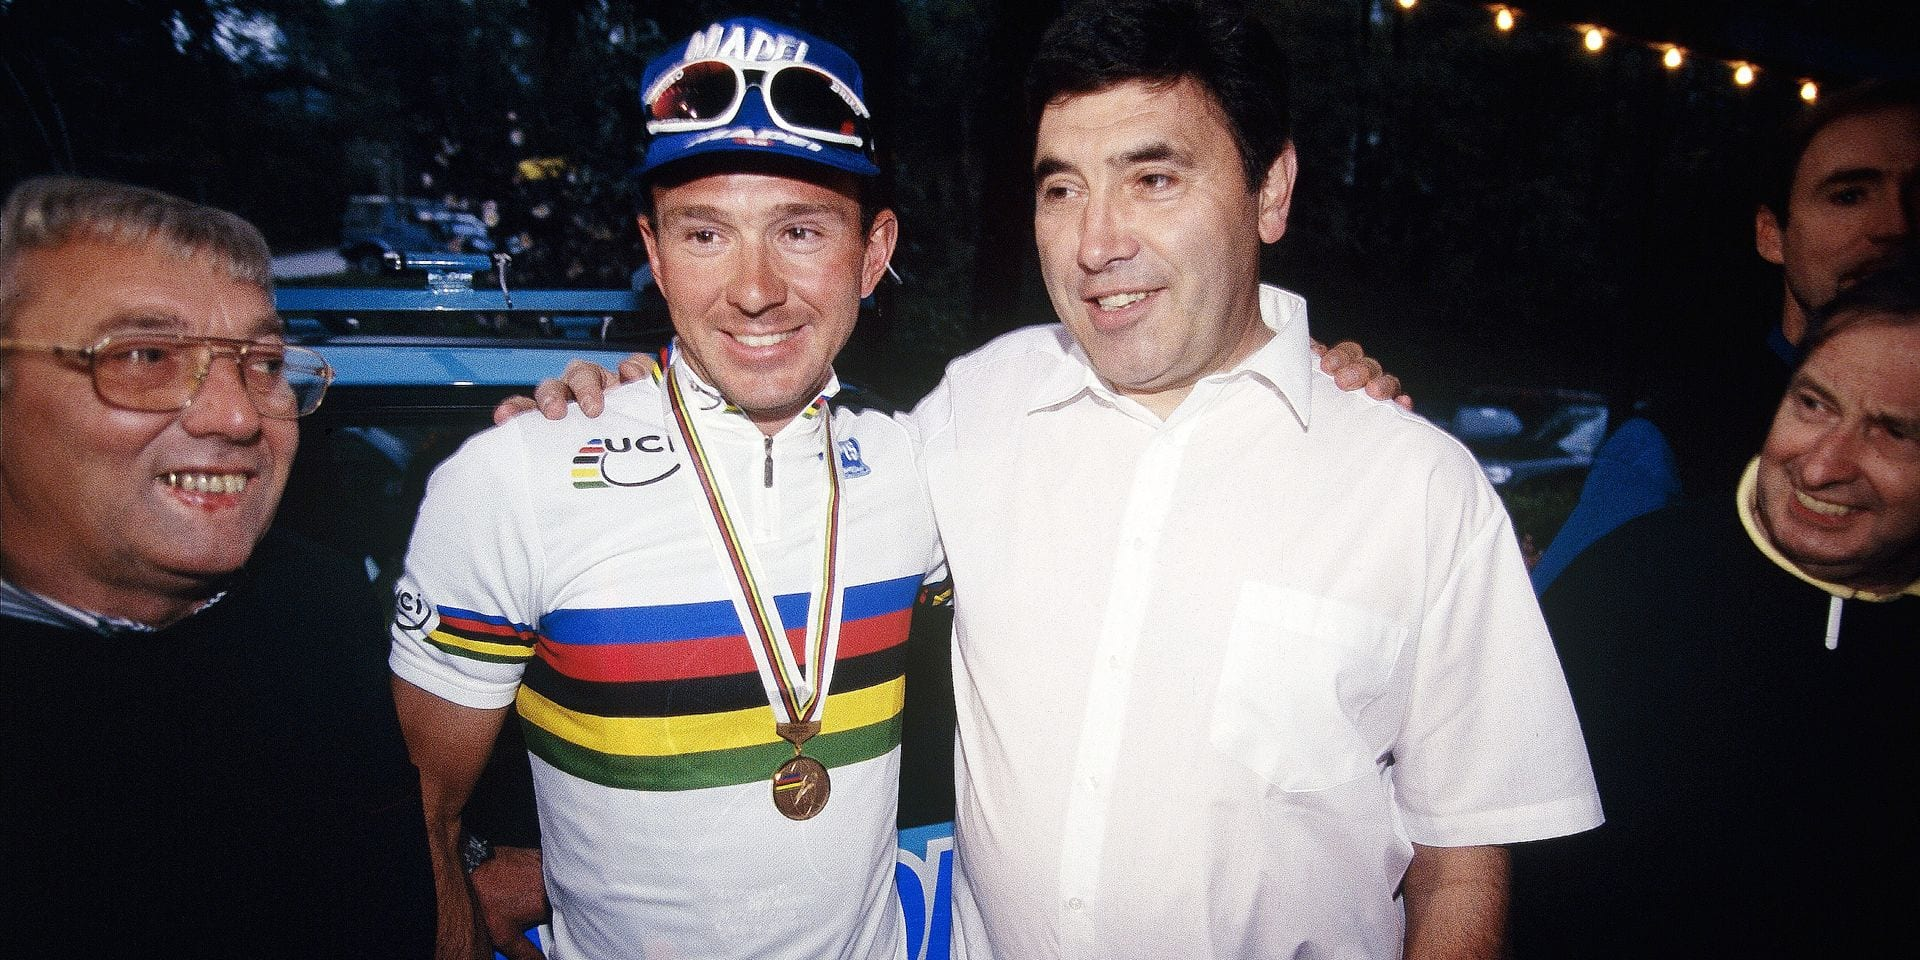 Cycling Johan MUSEEUW Eddy MERCKX (Lugano - 10/1996) REPORTERS©Michel Gouverneur